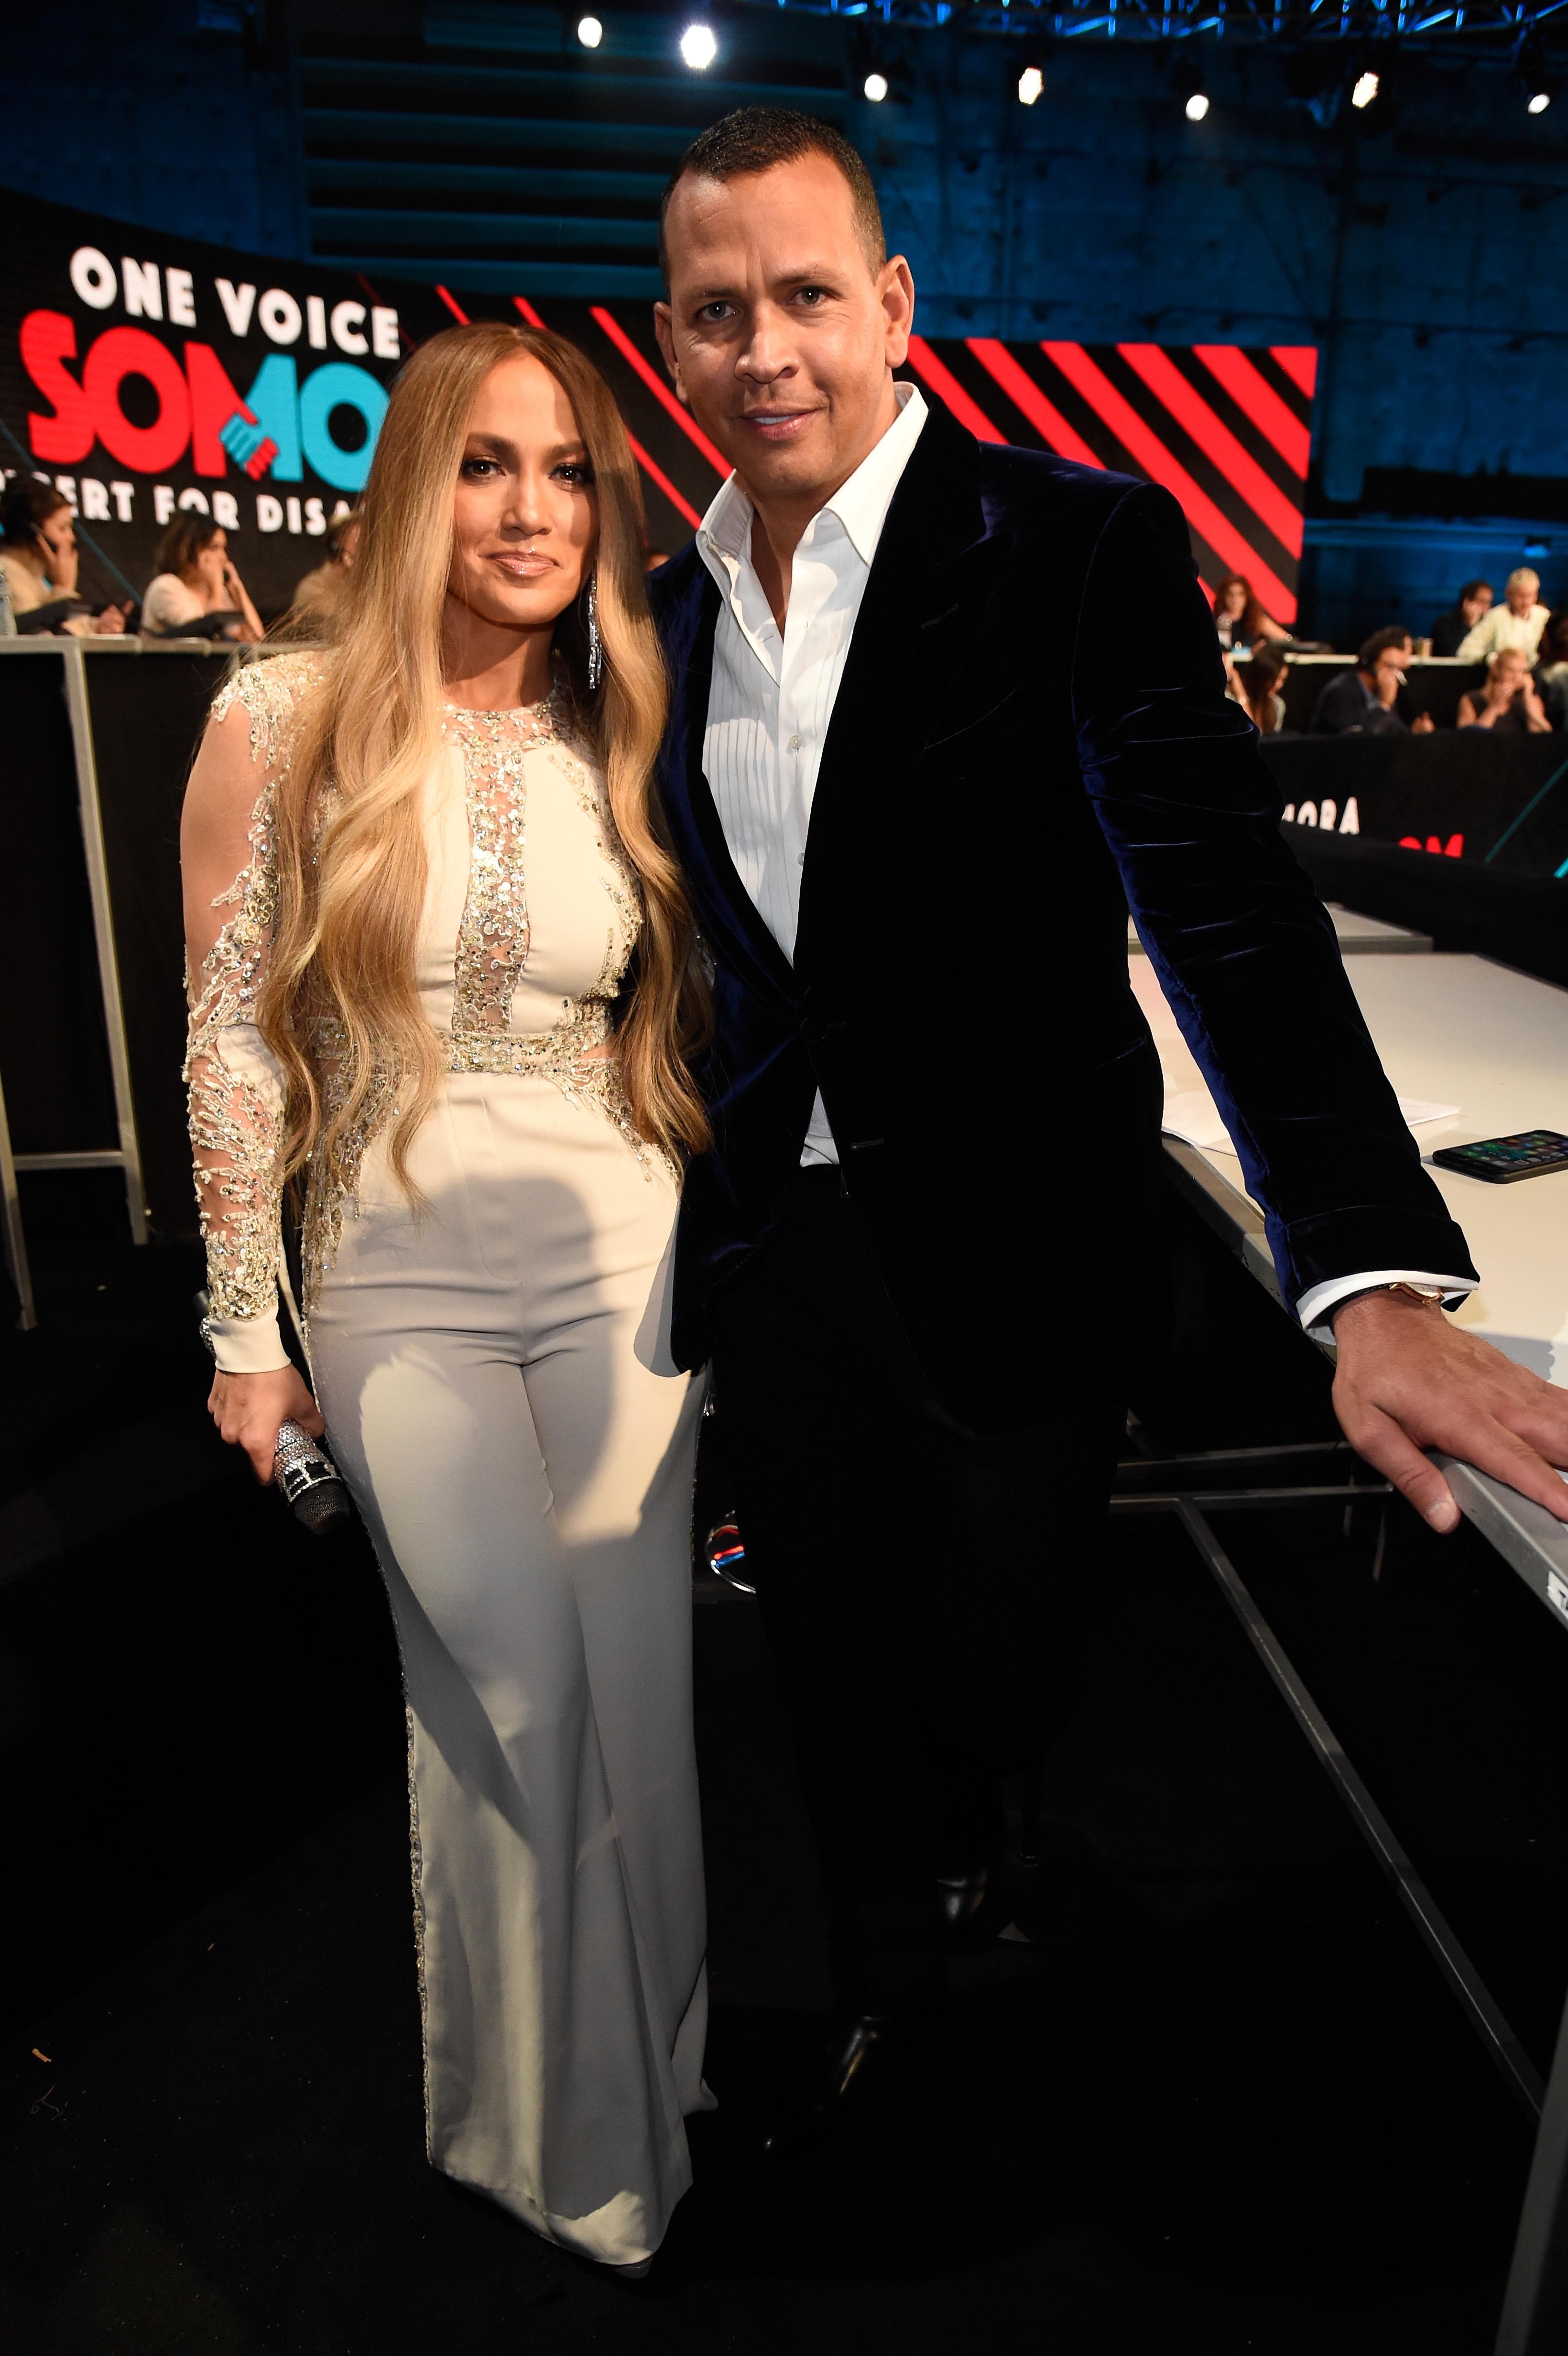 Jennifer Lopez, Jlo, estilo, looks, concierto, Somos una voz